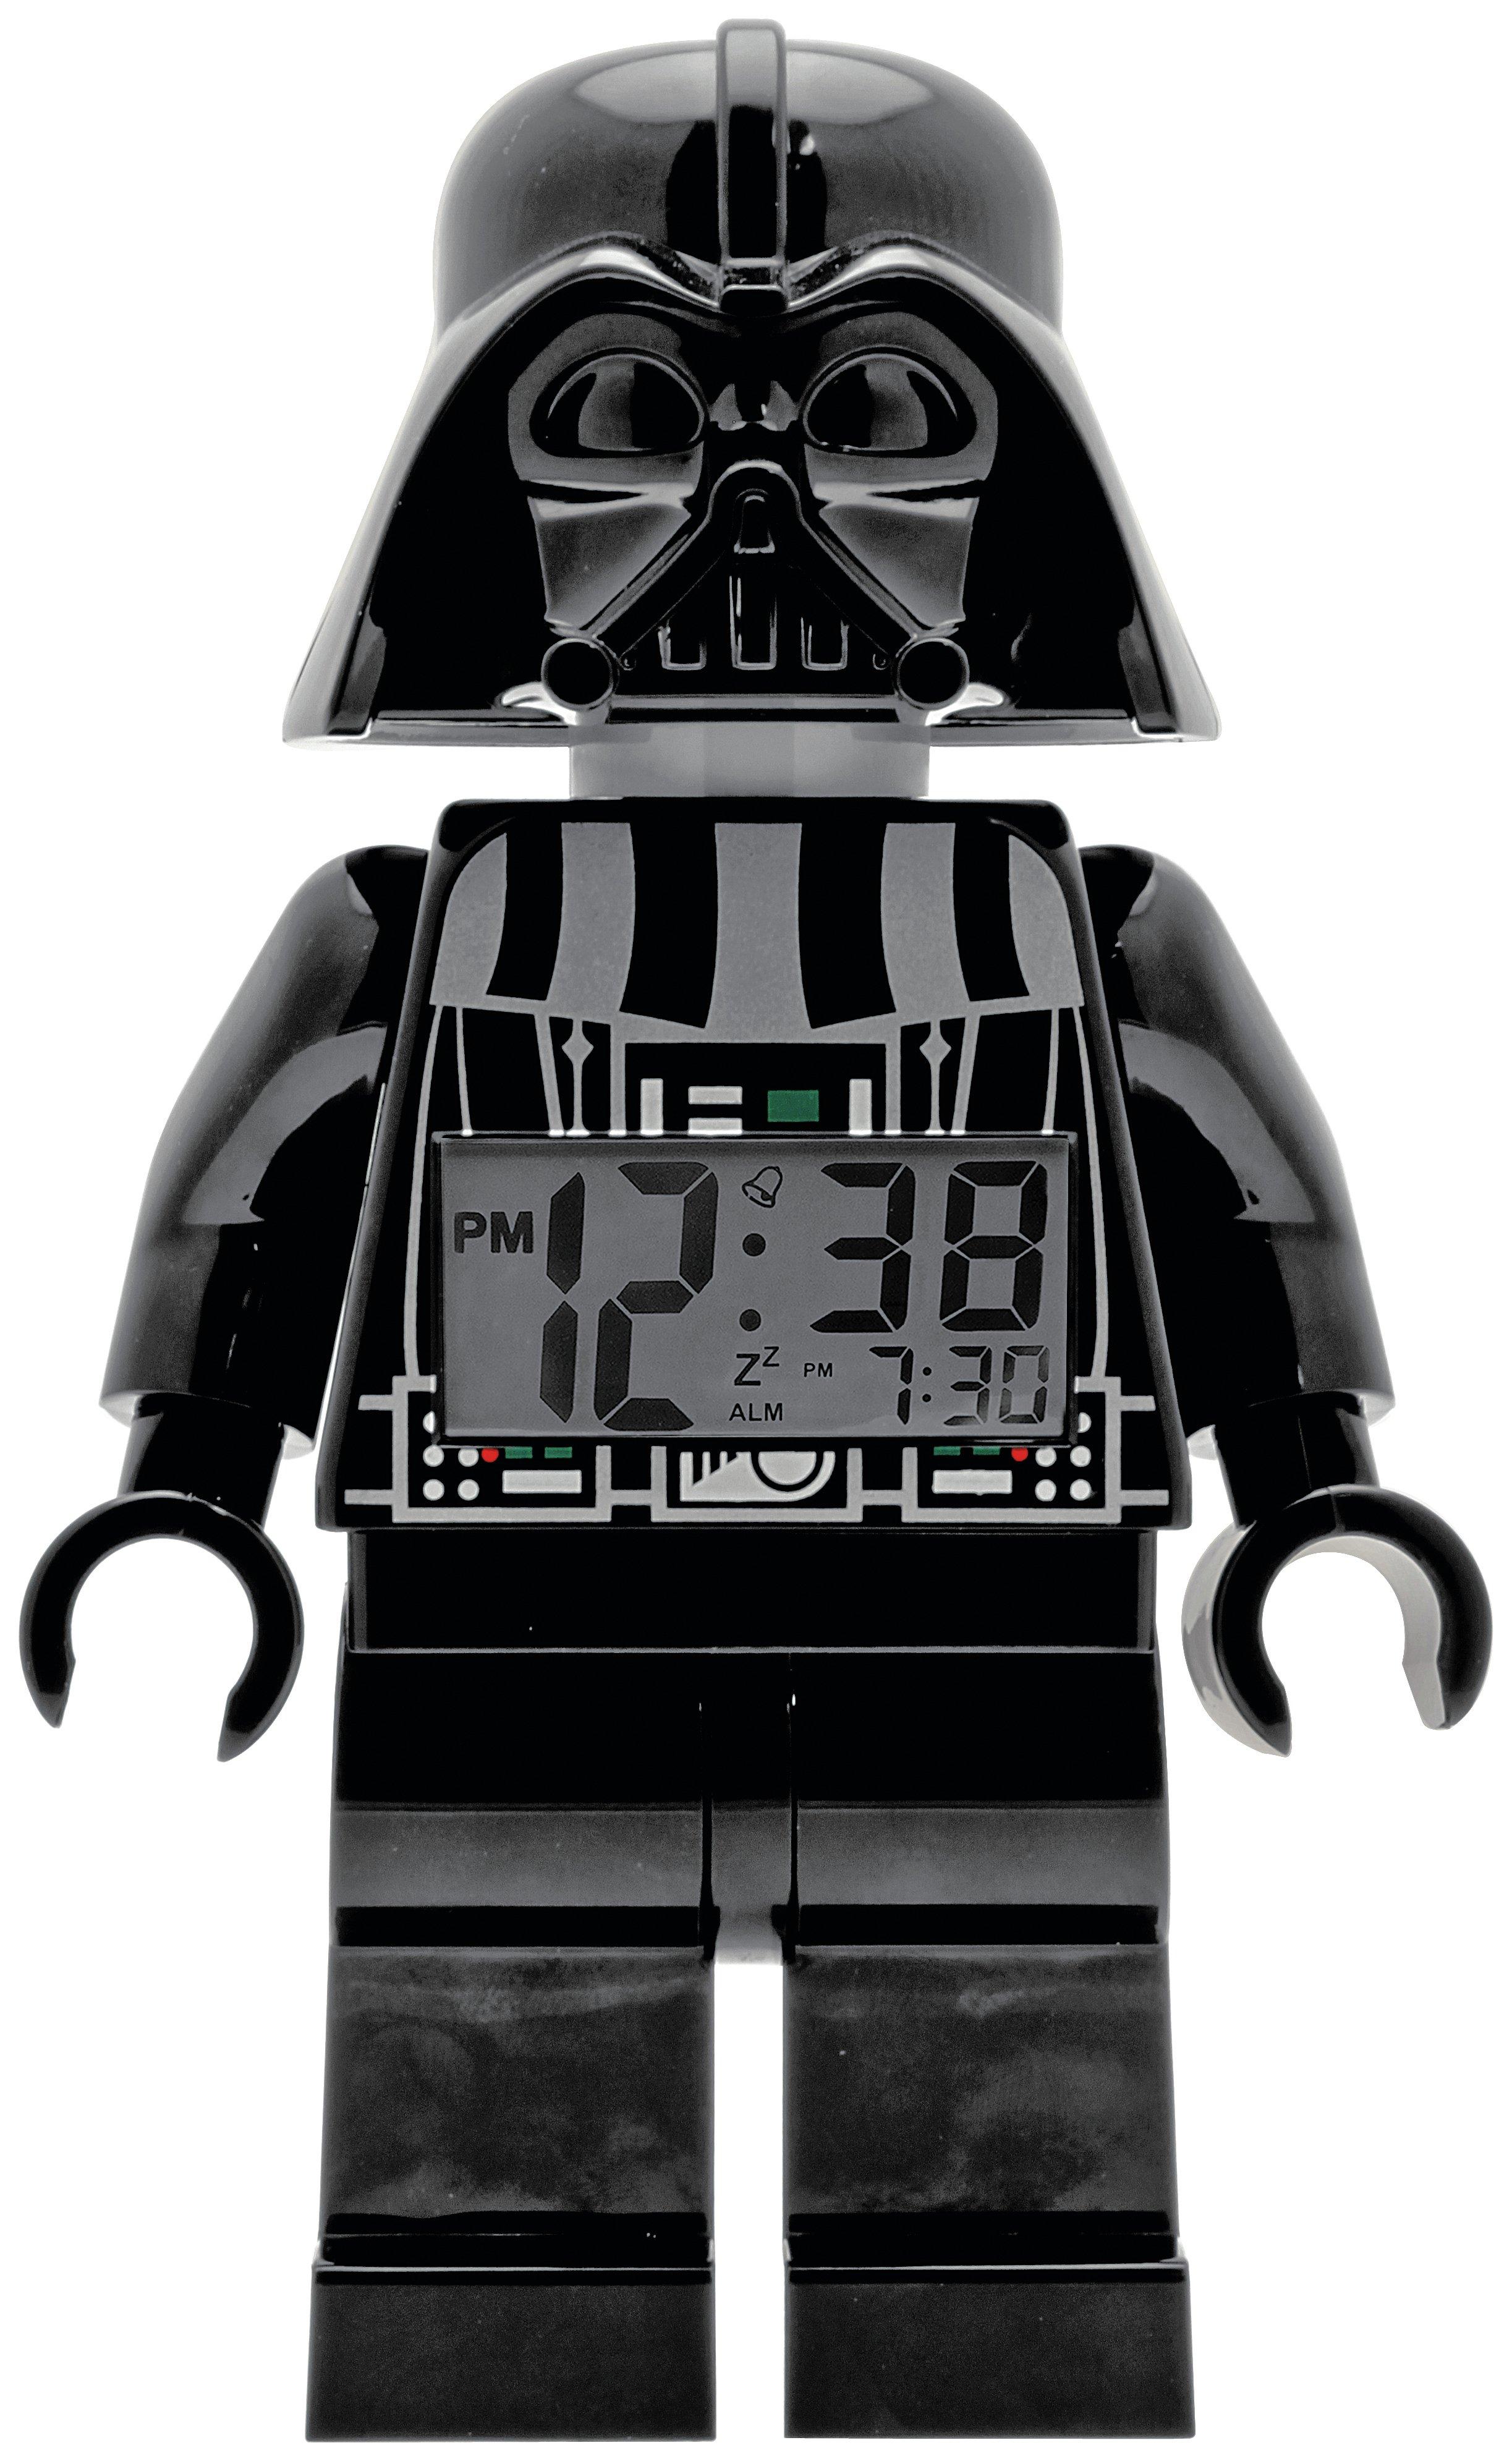 LEGO Star Wars Darth Vader Minifigure Alarm Clock